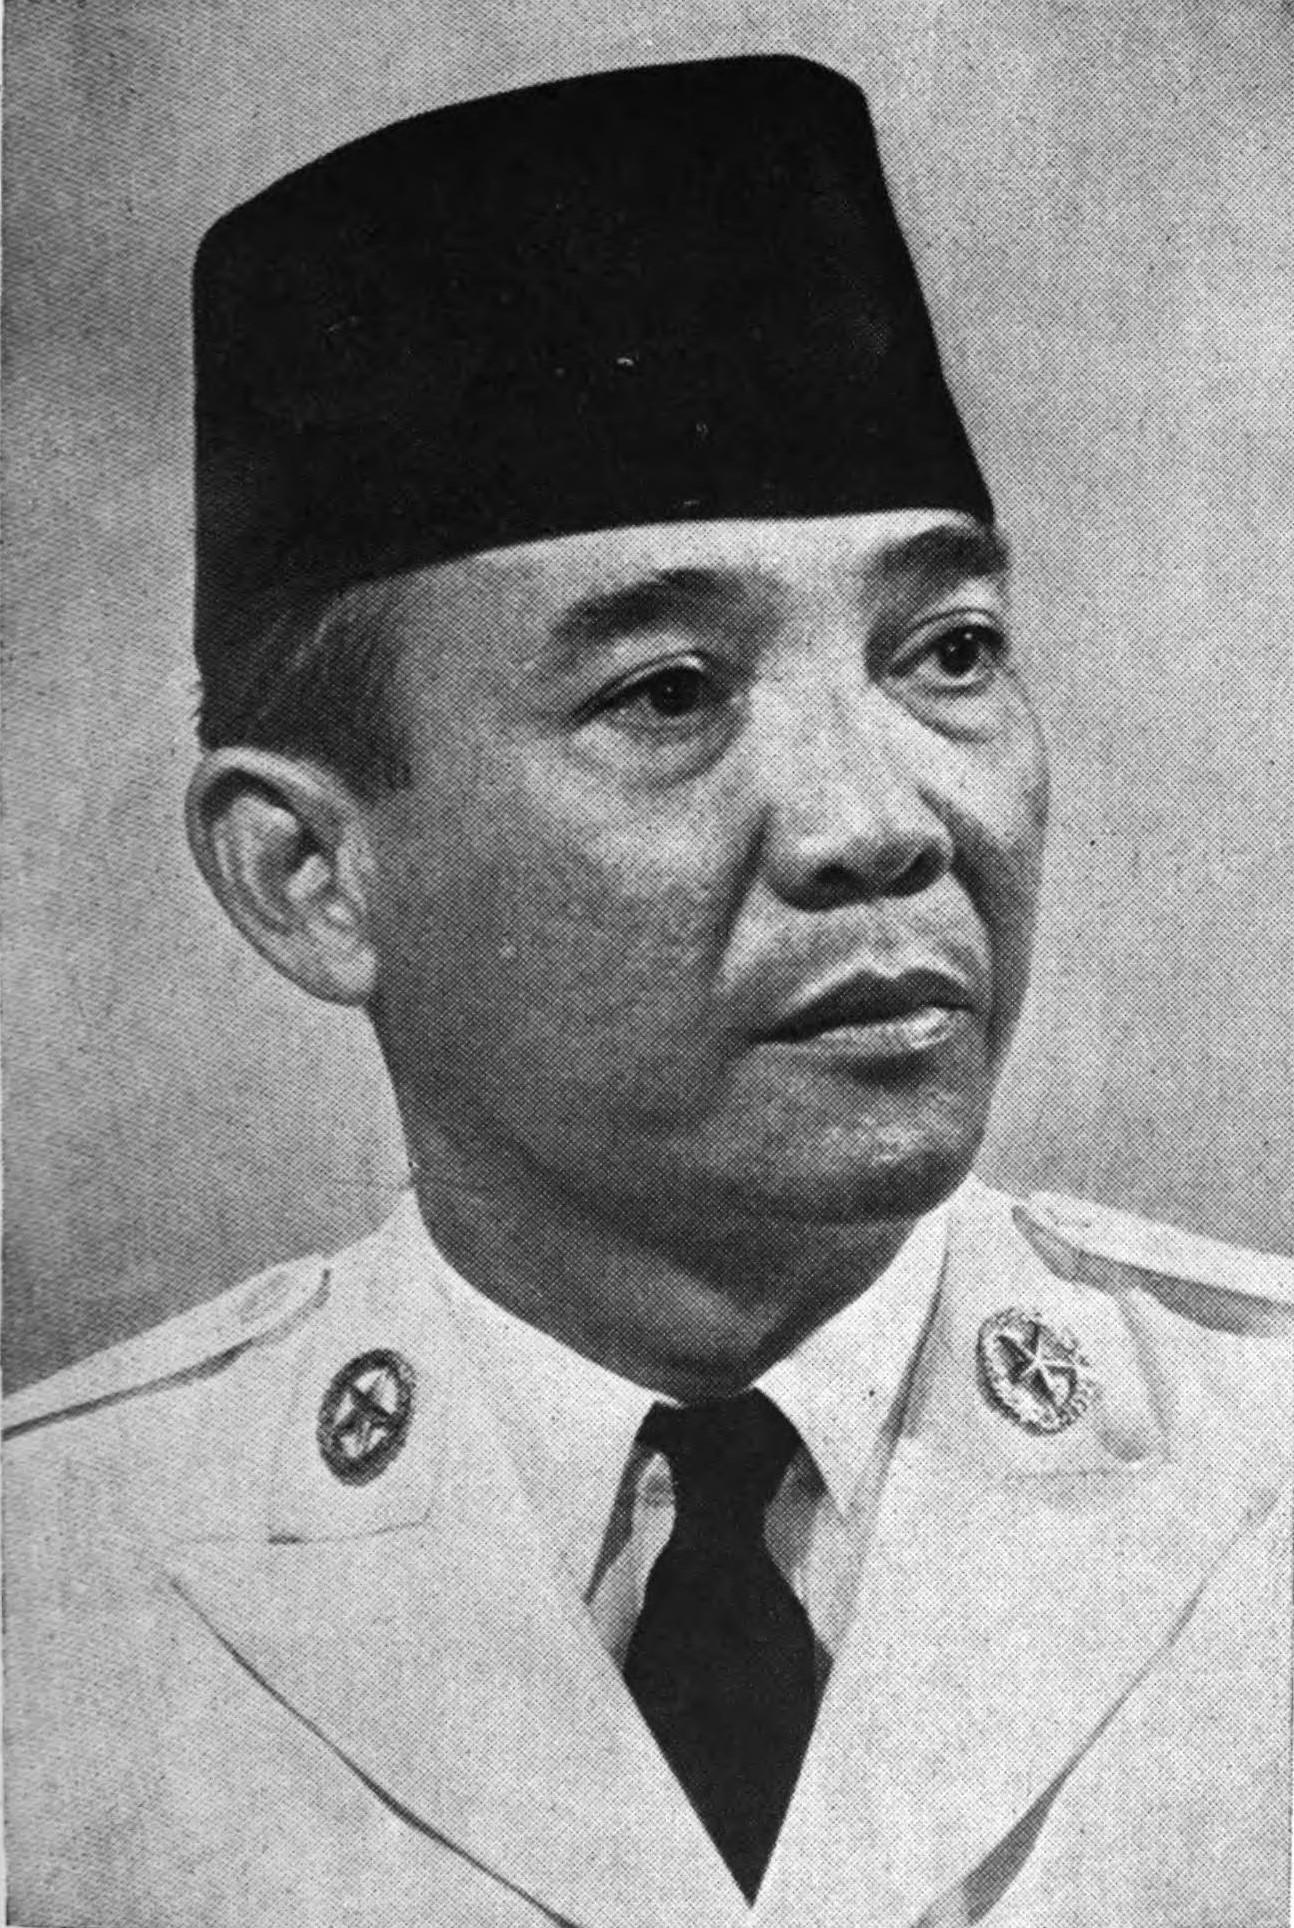 https://i0.wp.com/upload.wikimedia.org/wikipedia/commons/c/c5/Soekarno.jpg